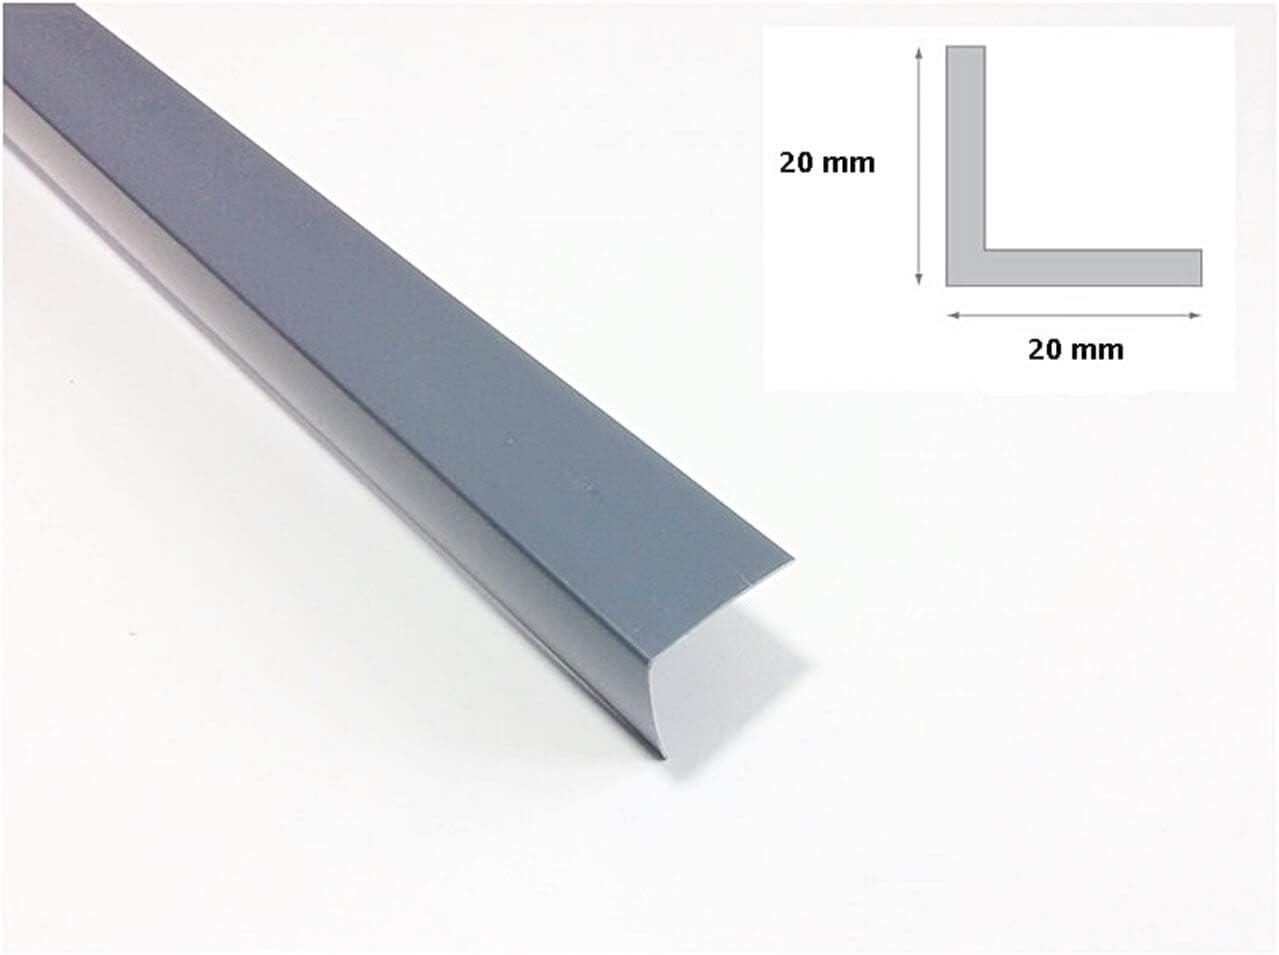 17 x 5 mm PVC Winkel Kunststoffwinkel Winkelprofile Kunststoffleiste Profil Eckschutzleiste Kantenschoner ungleich Grau 1m 106